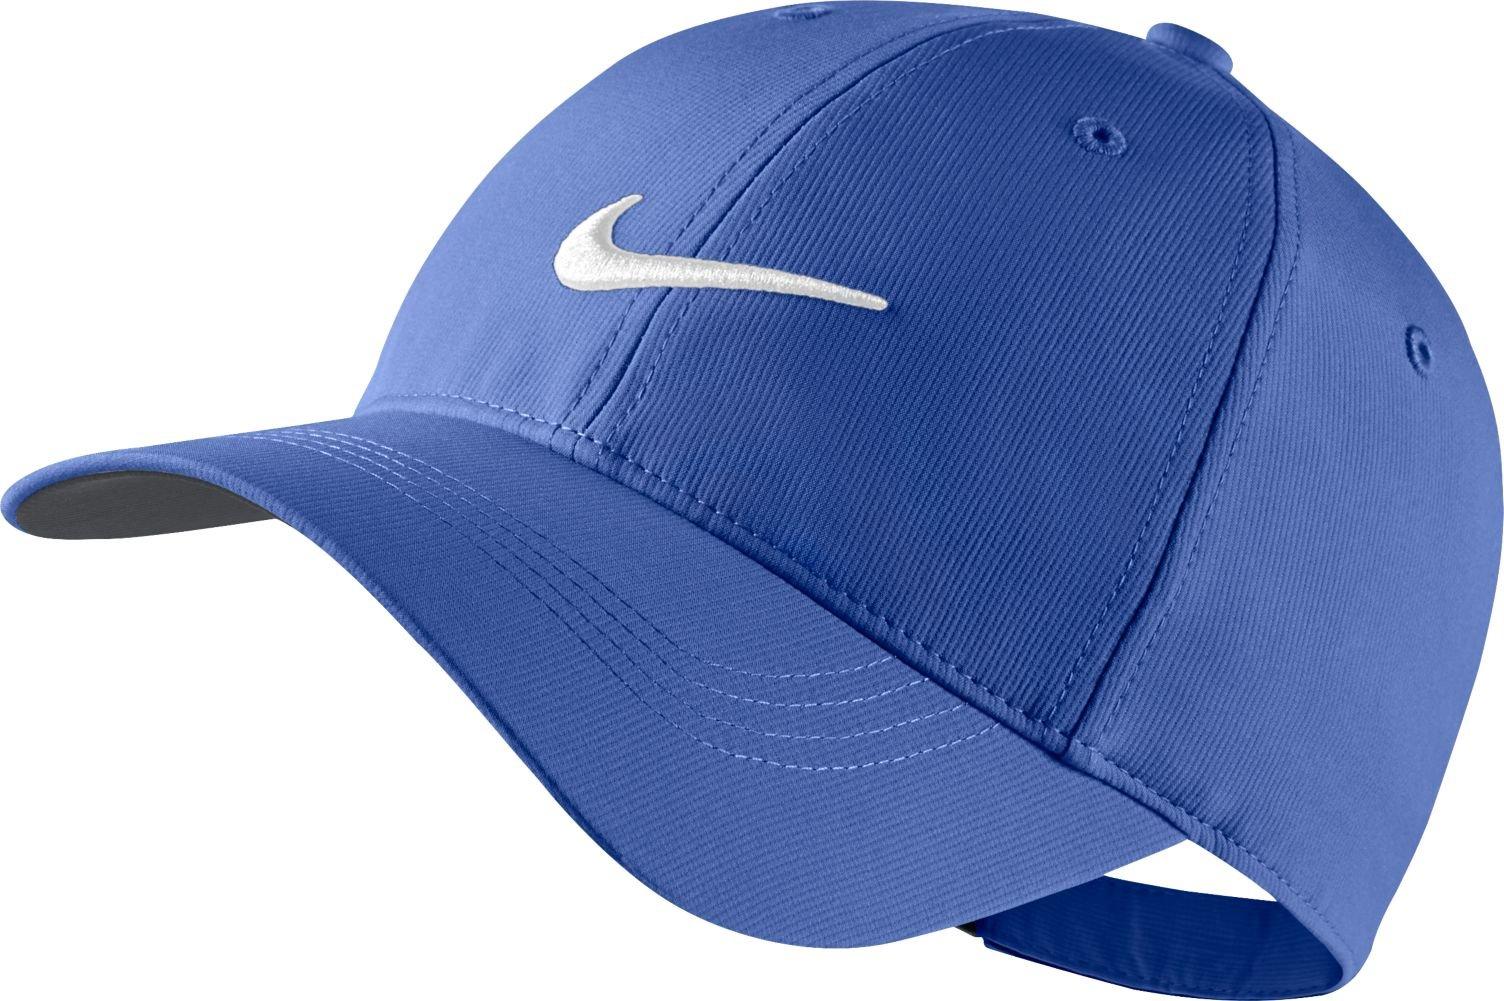 Nike Legacy 91 Tech Swoosh Hat - Game Royal